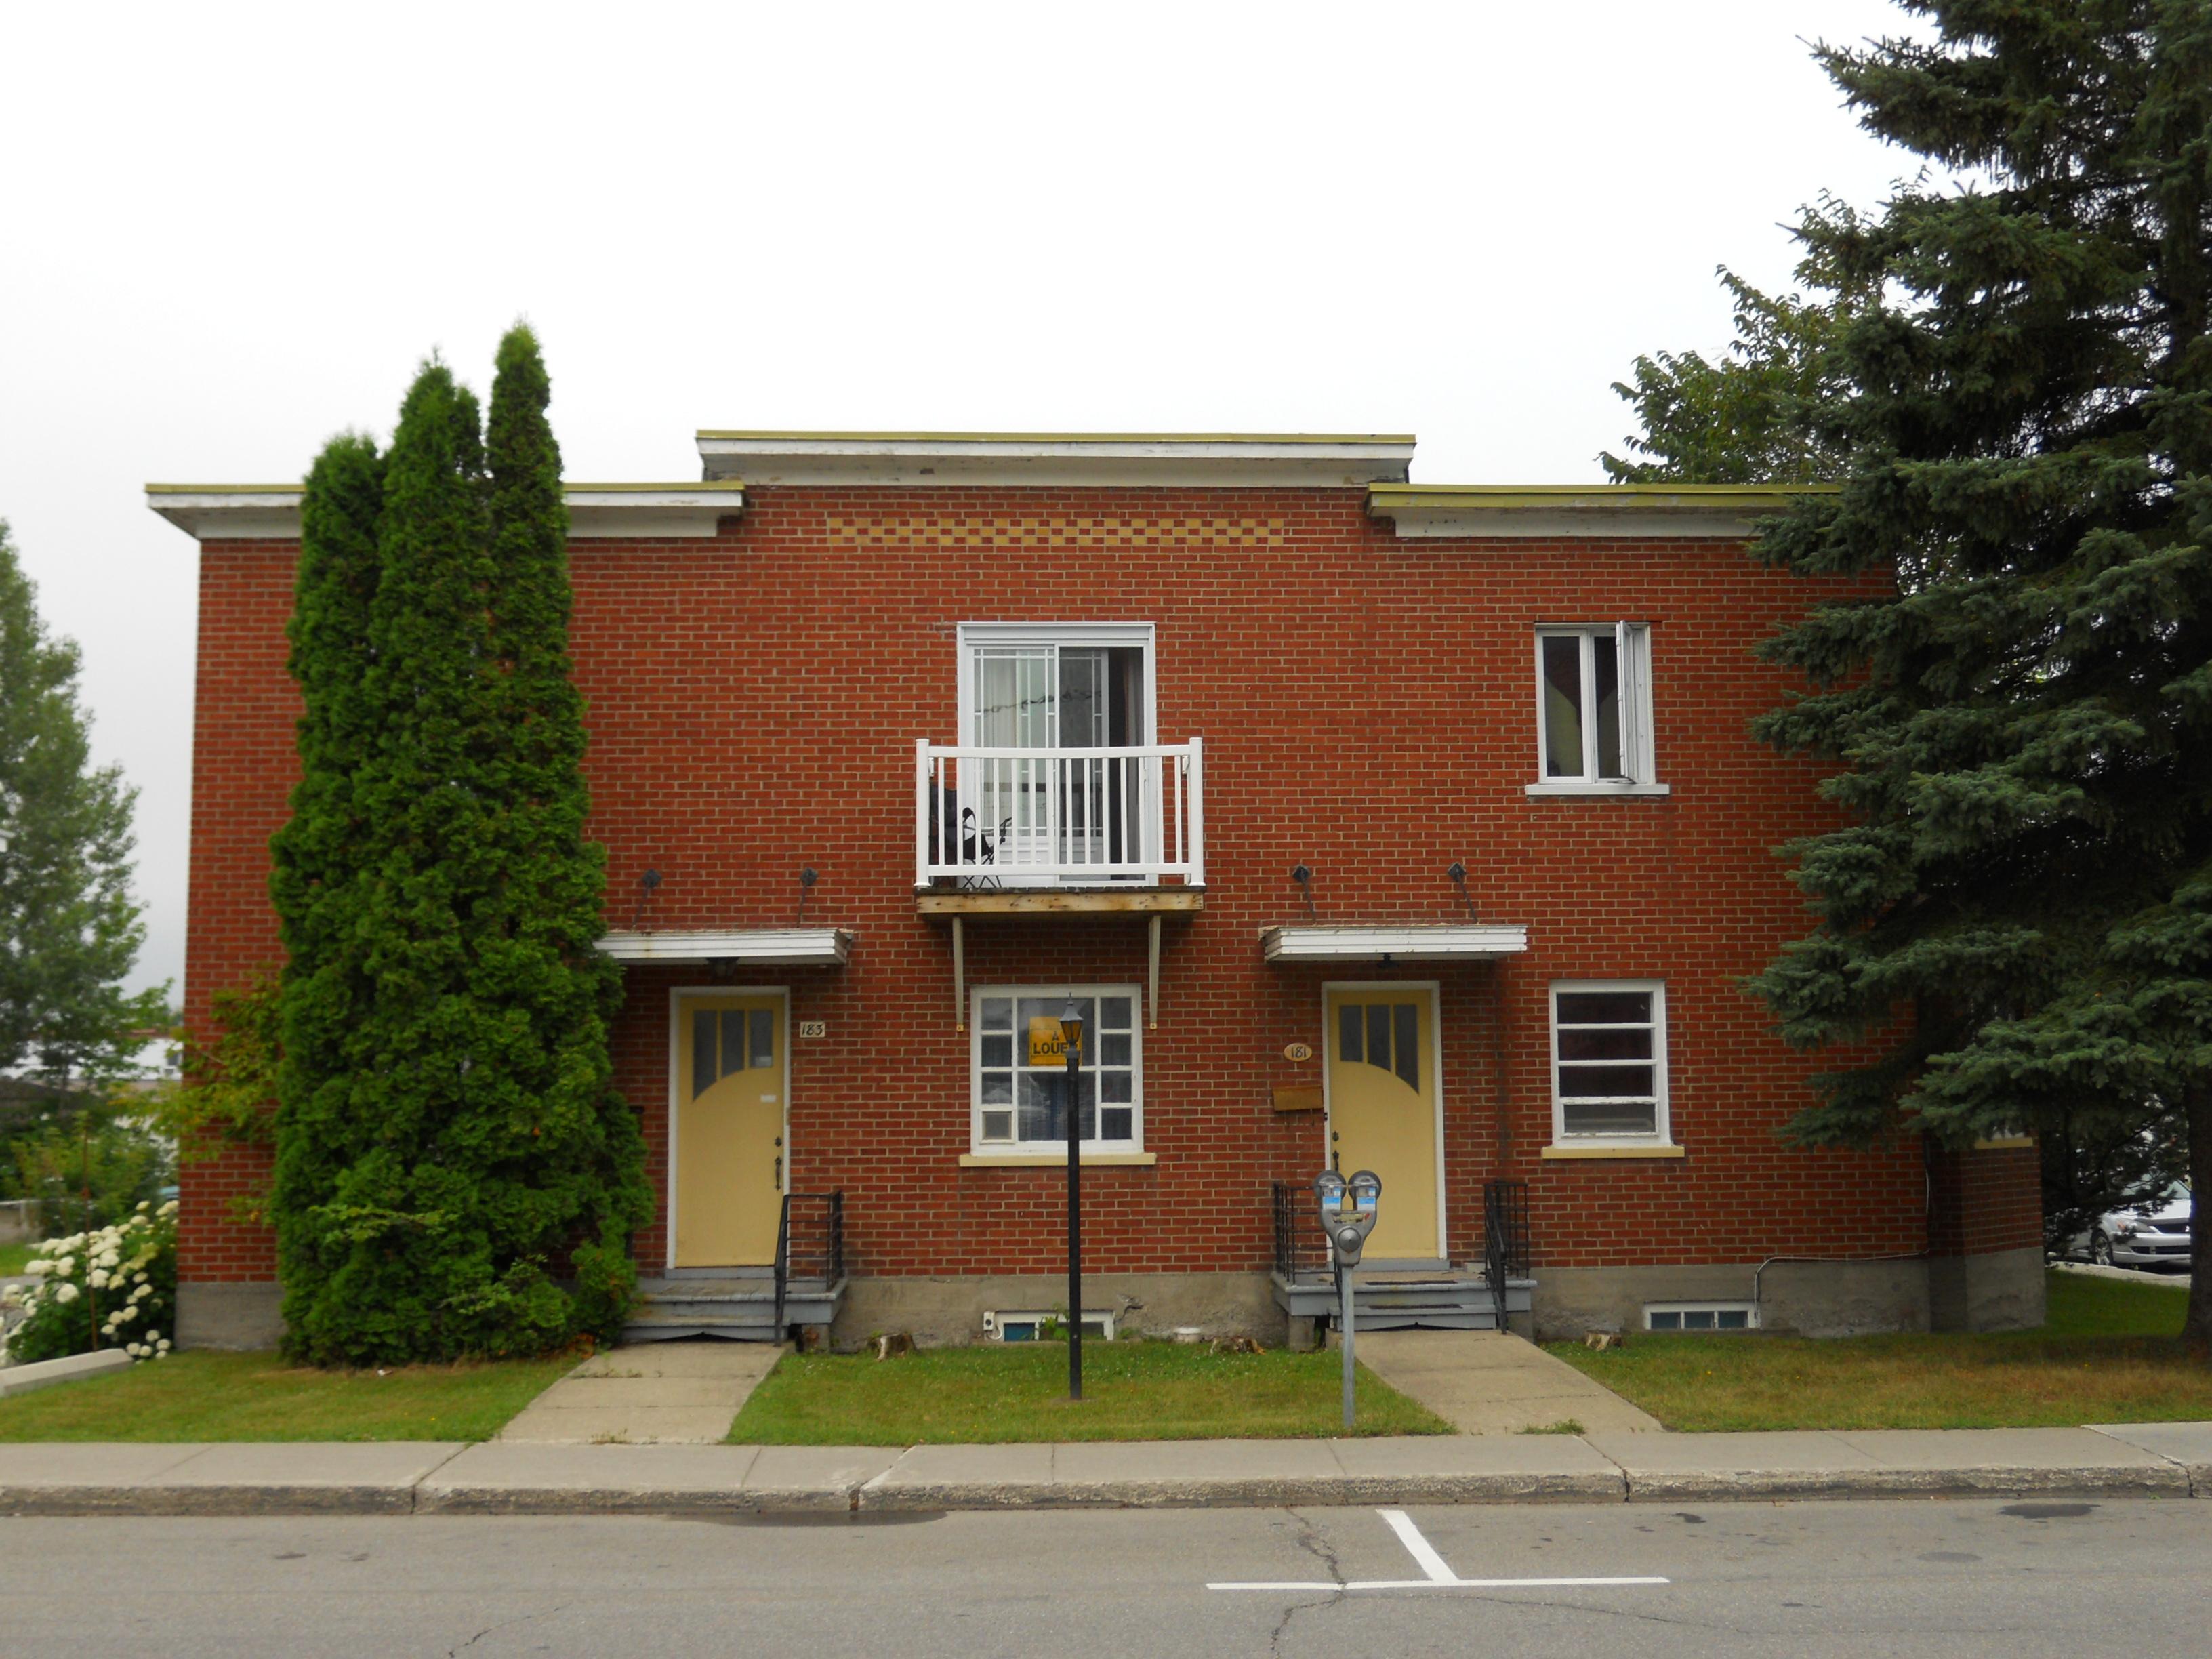 1225 - 181-183, avenue Rouleau